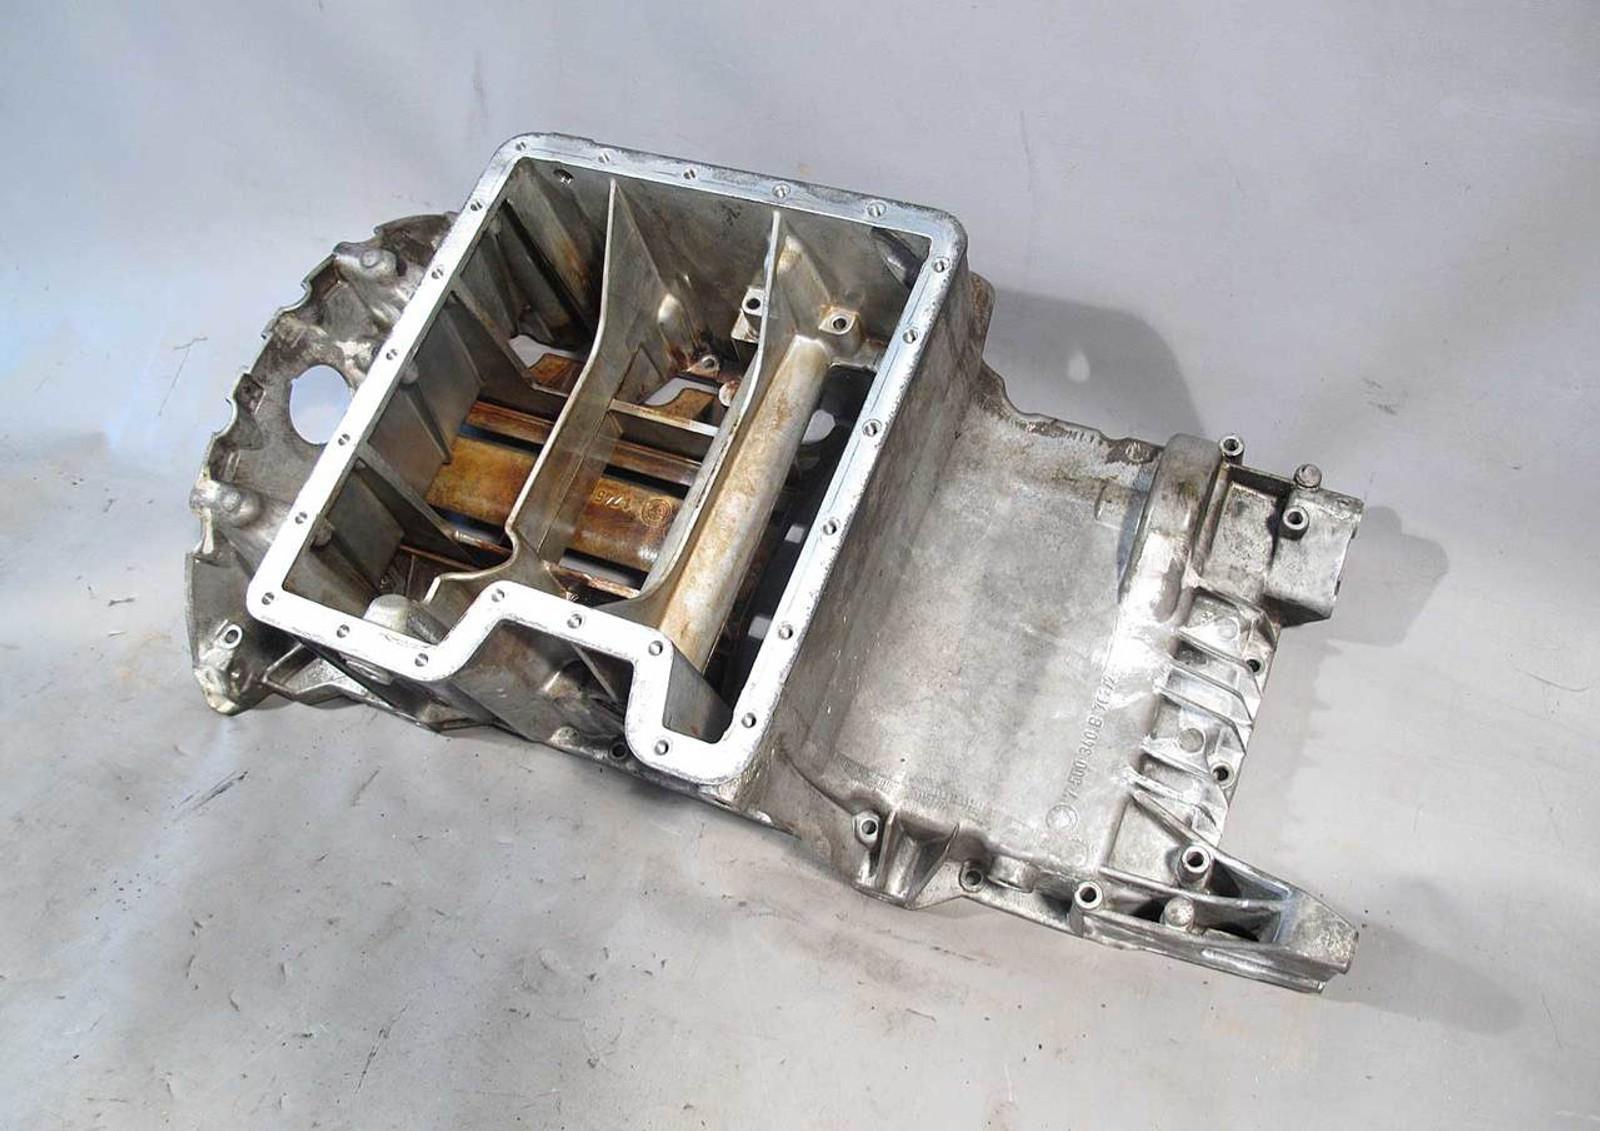 bmw e53 x5 4.4 v8 m62tu engine oil pan upper and lower w//baffle and level sensor